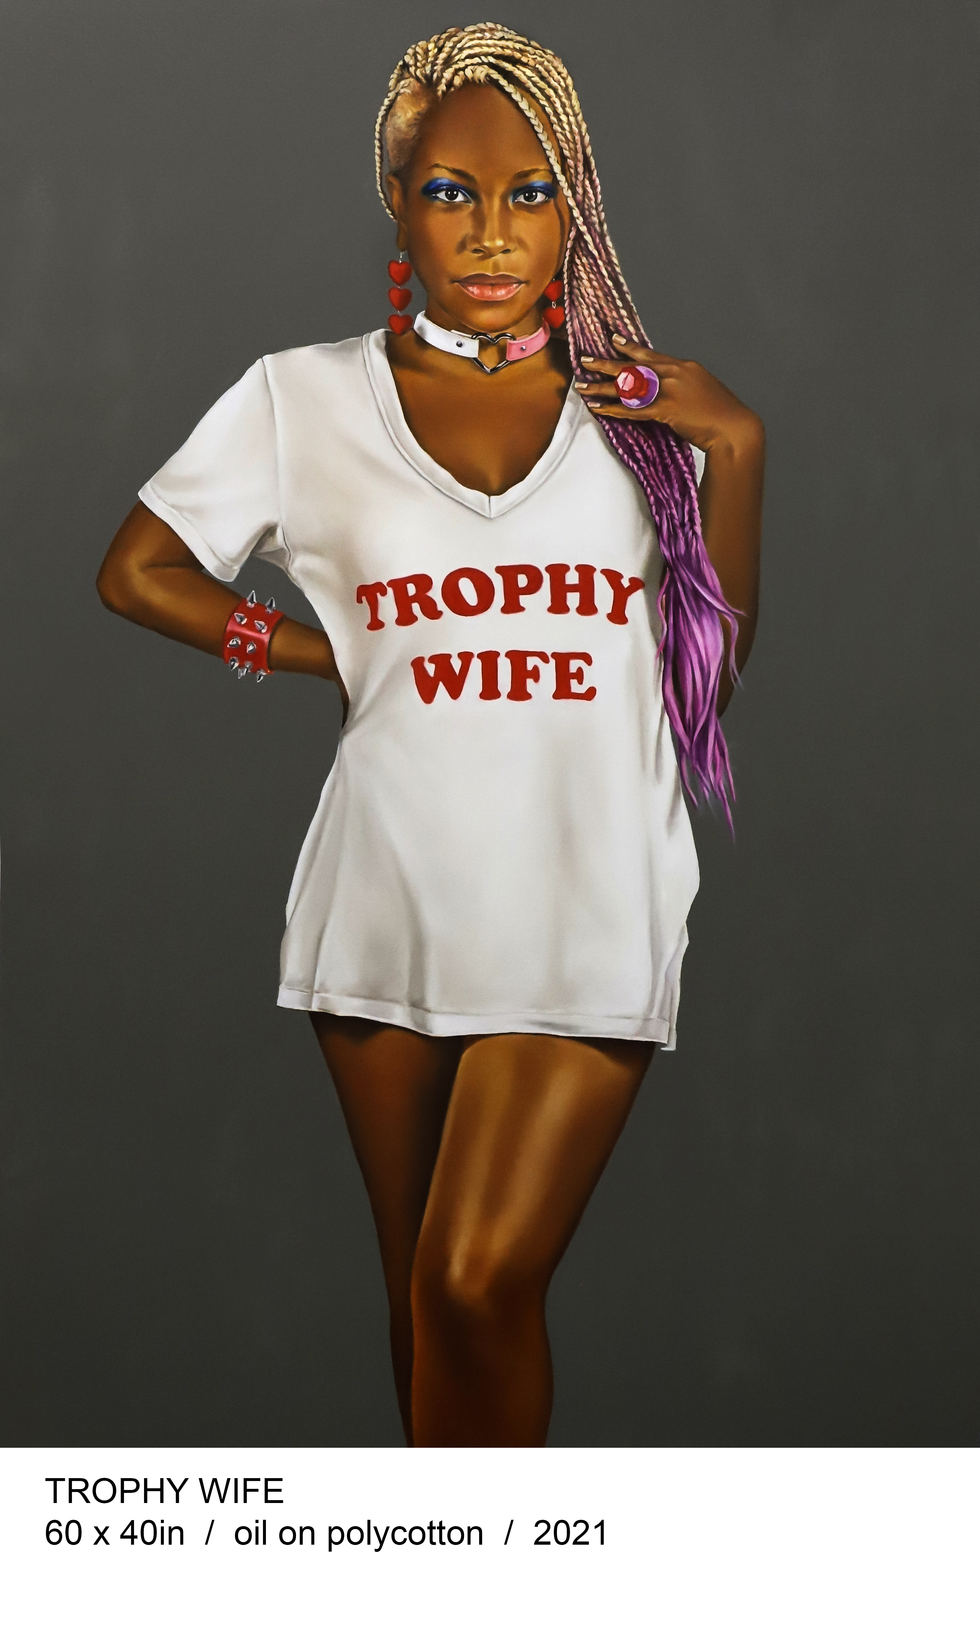 wix Trophy Wife 60x40in oil on polycotton 2021 Tara Lewis.jpg